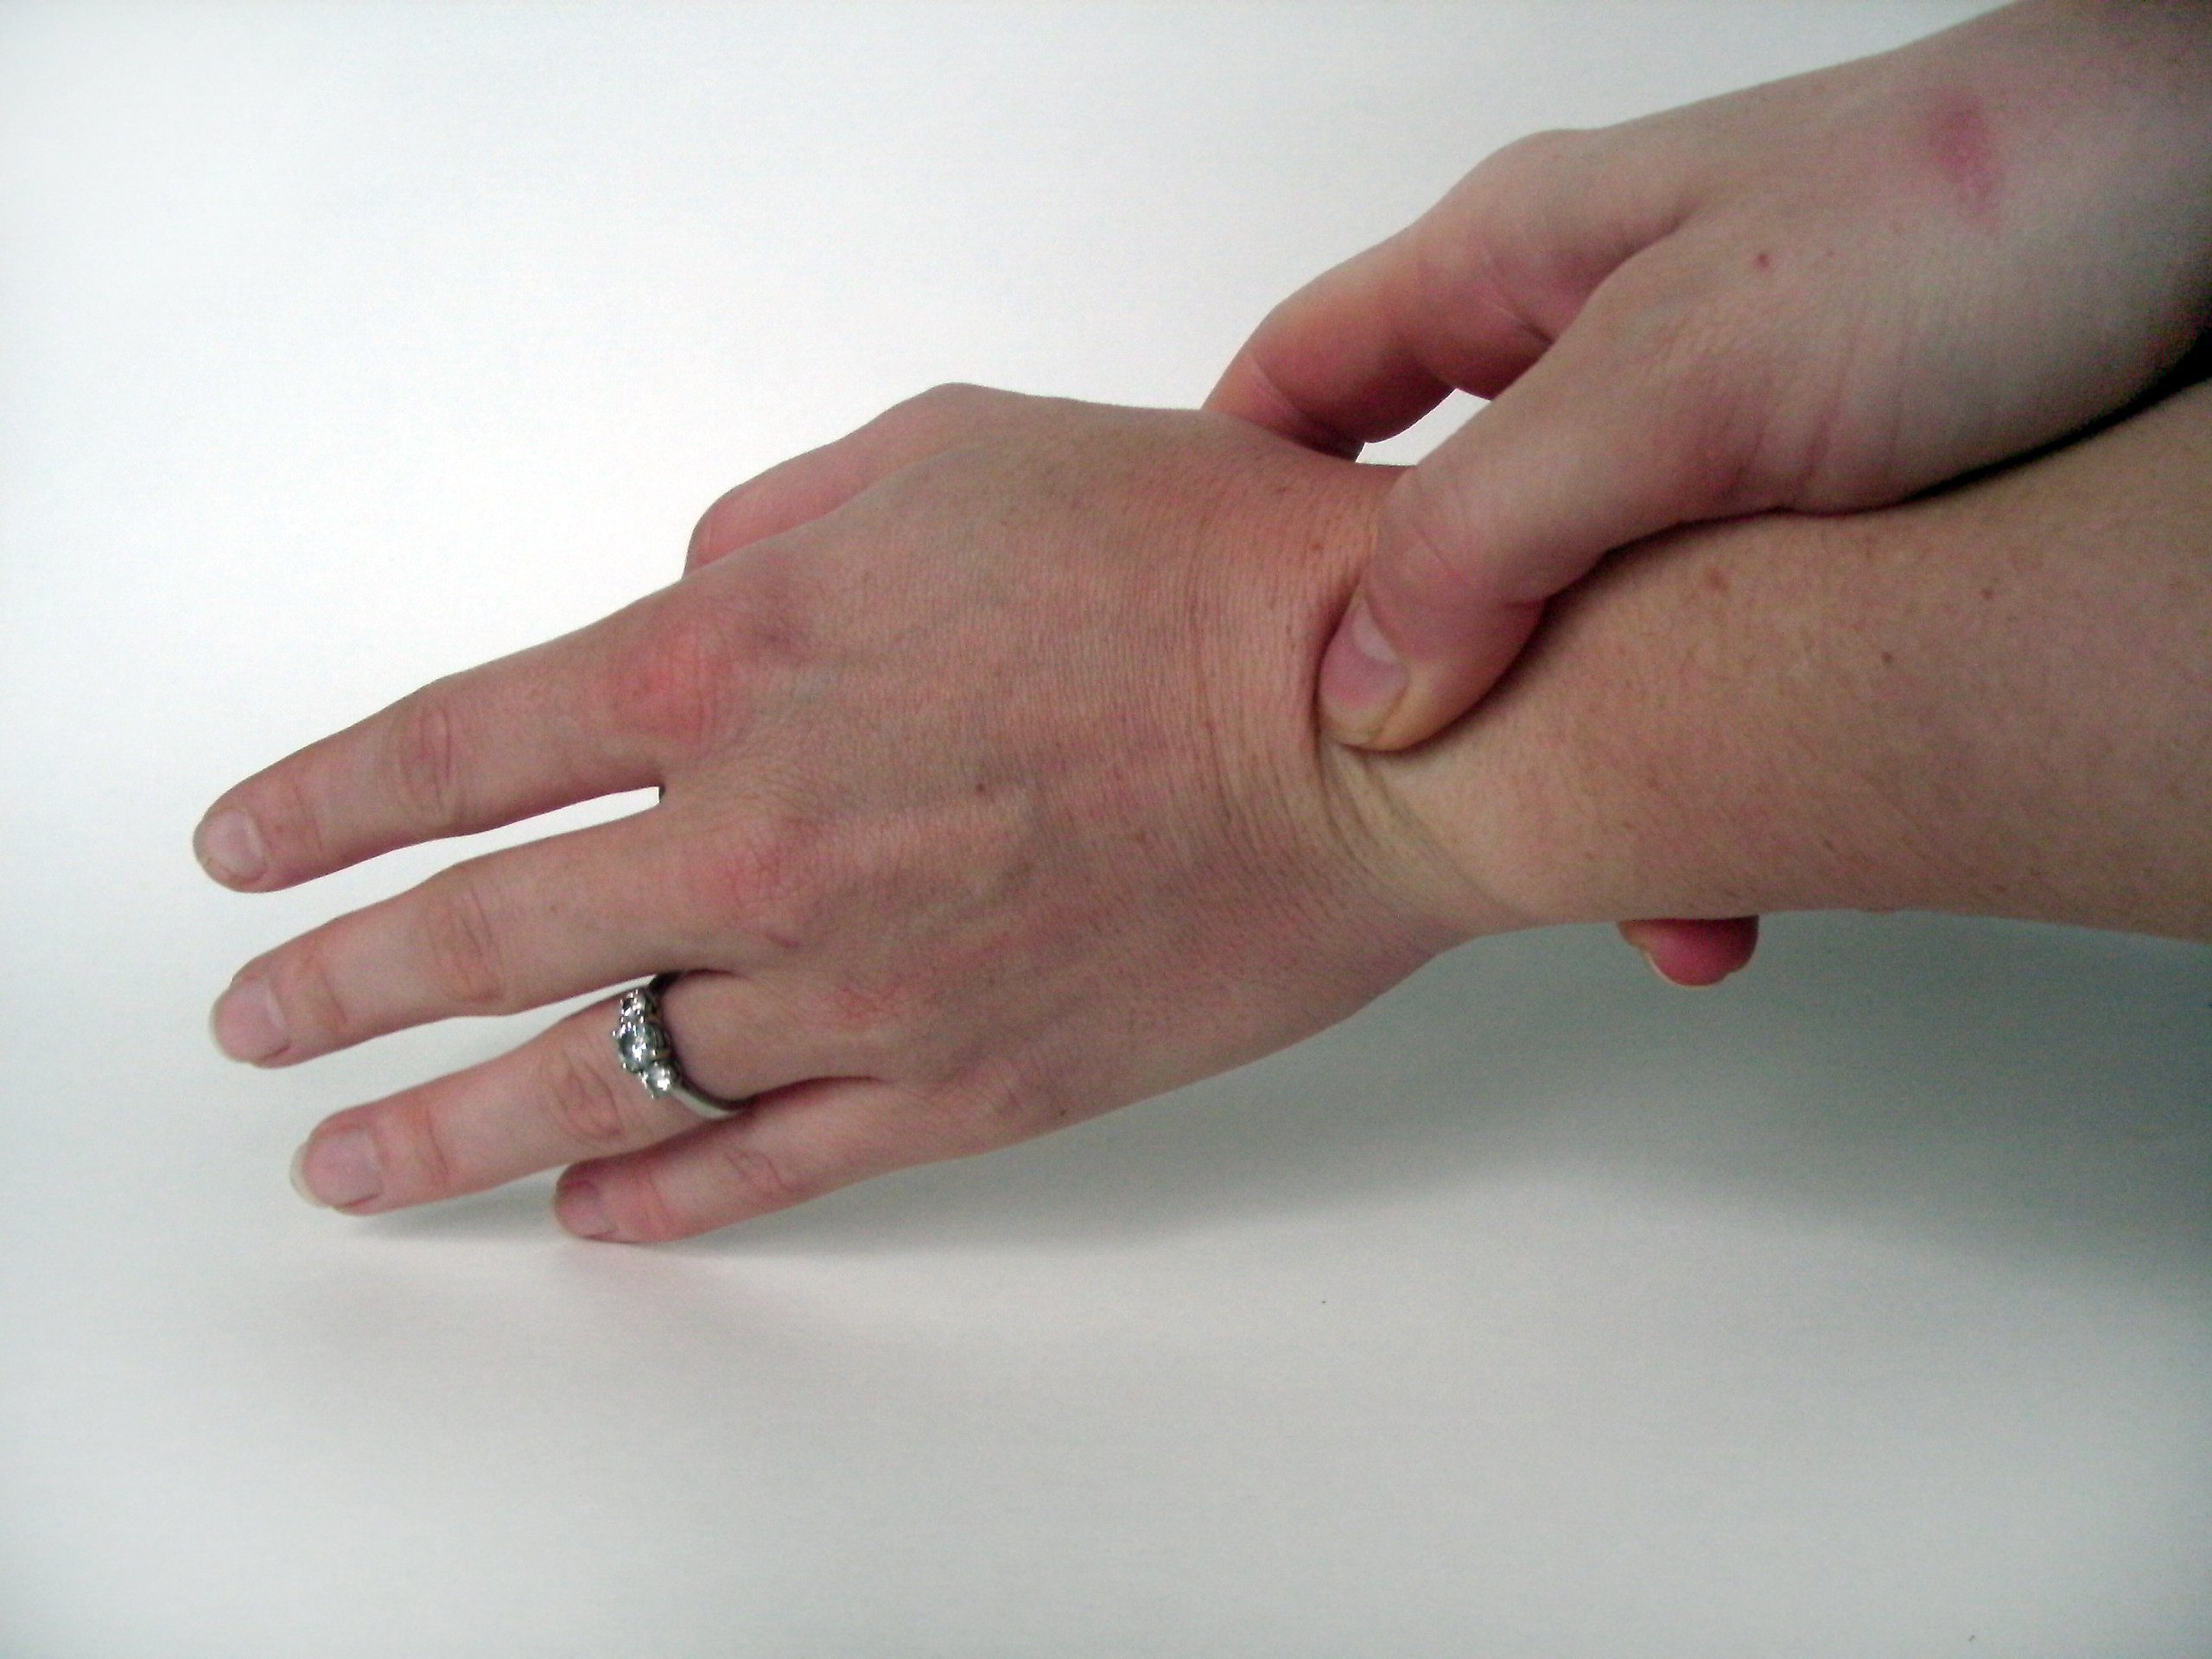 sore-wrists